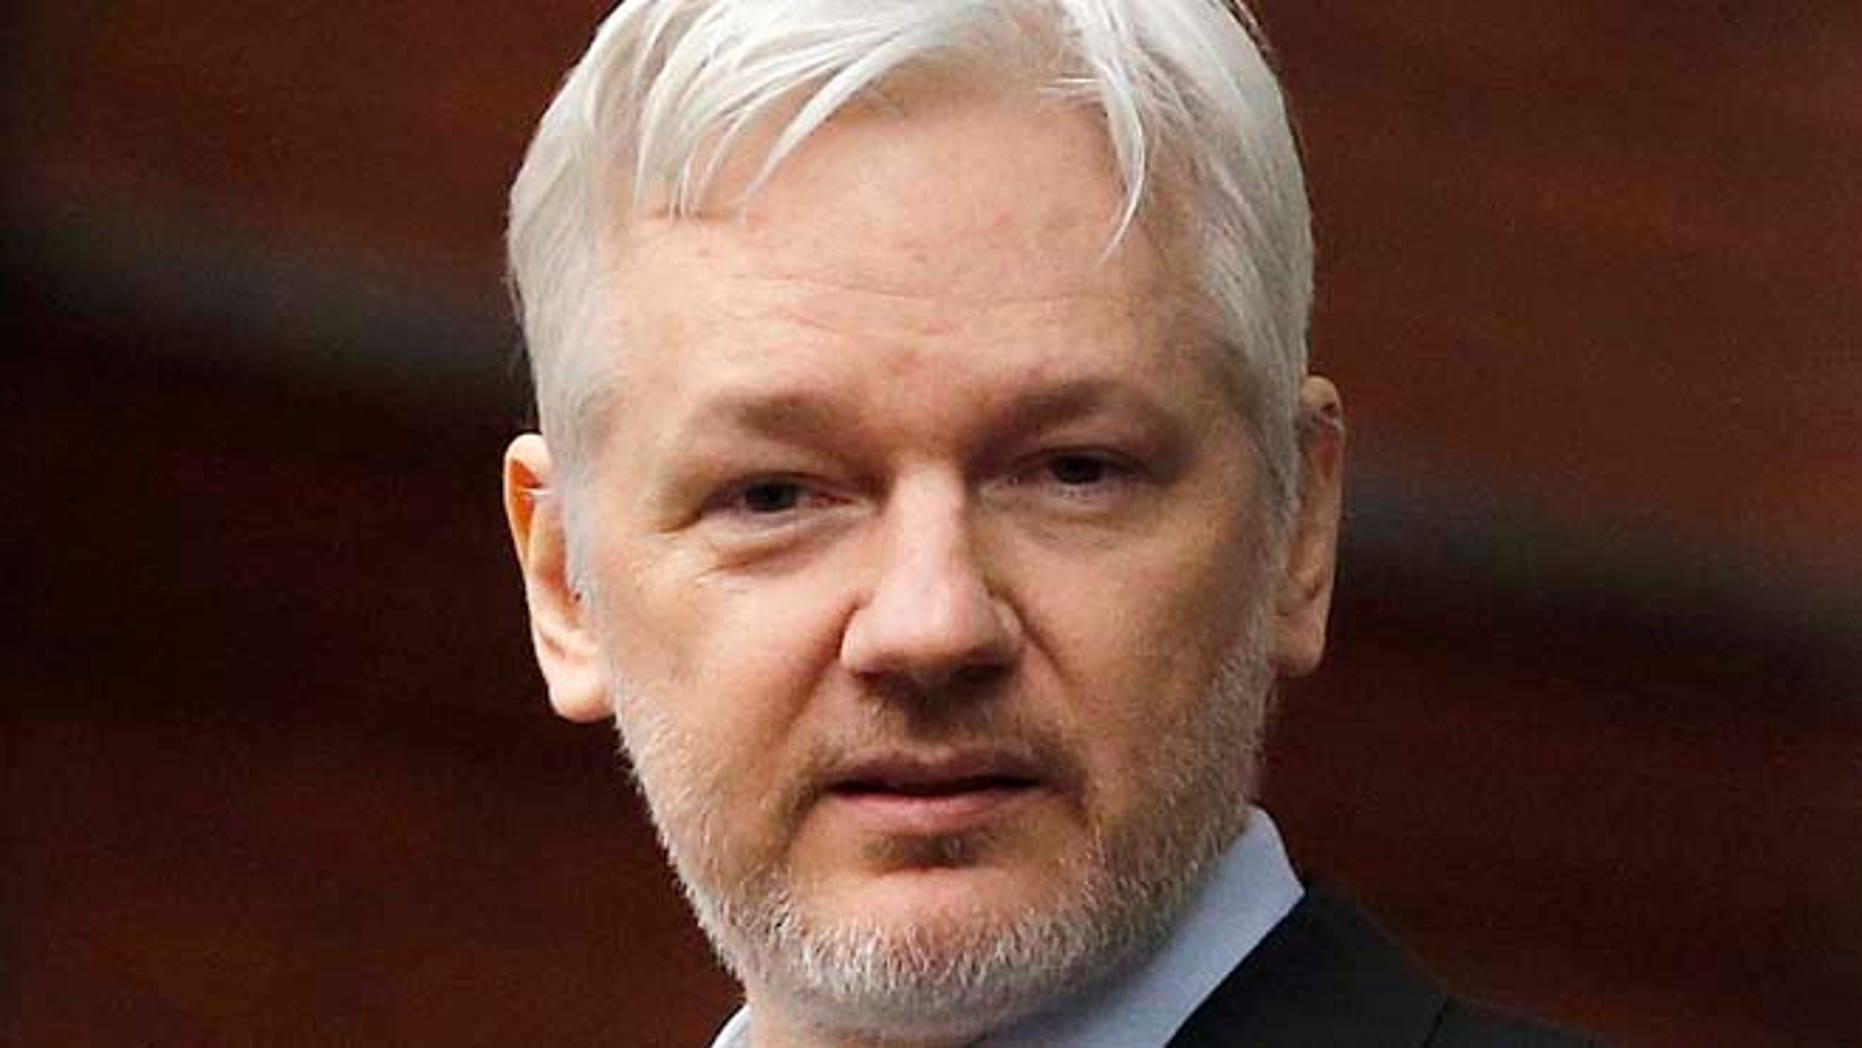 Julian Assange on the balcony of the Ecuadorean Embassy in London on Feb. 5, 2016.